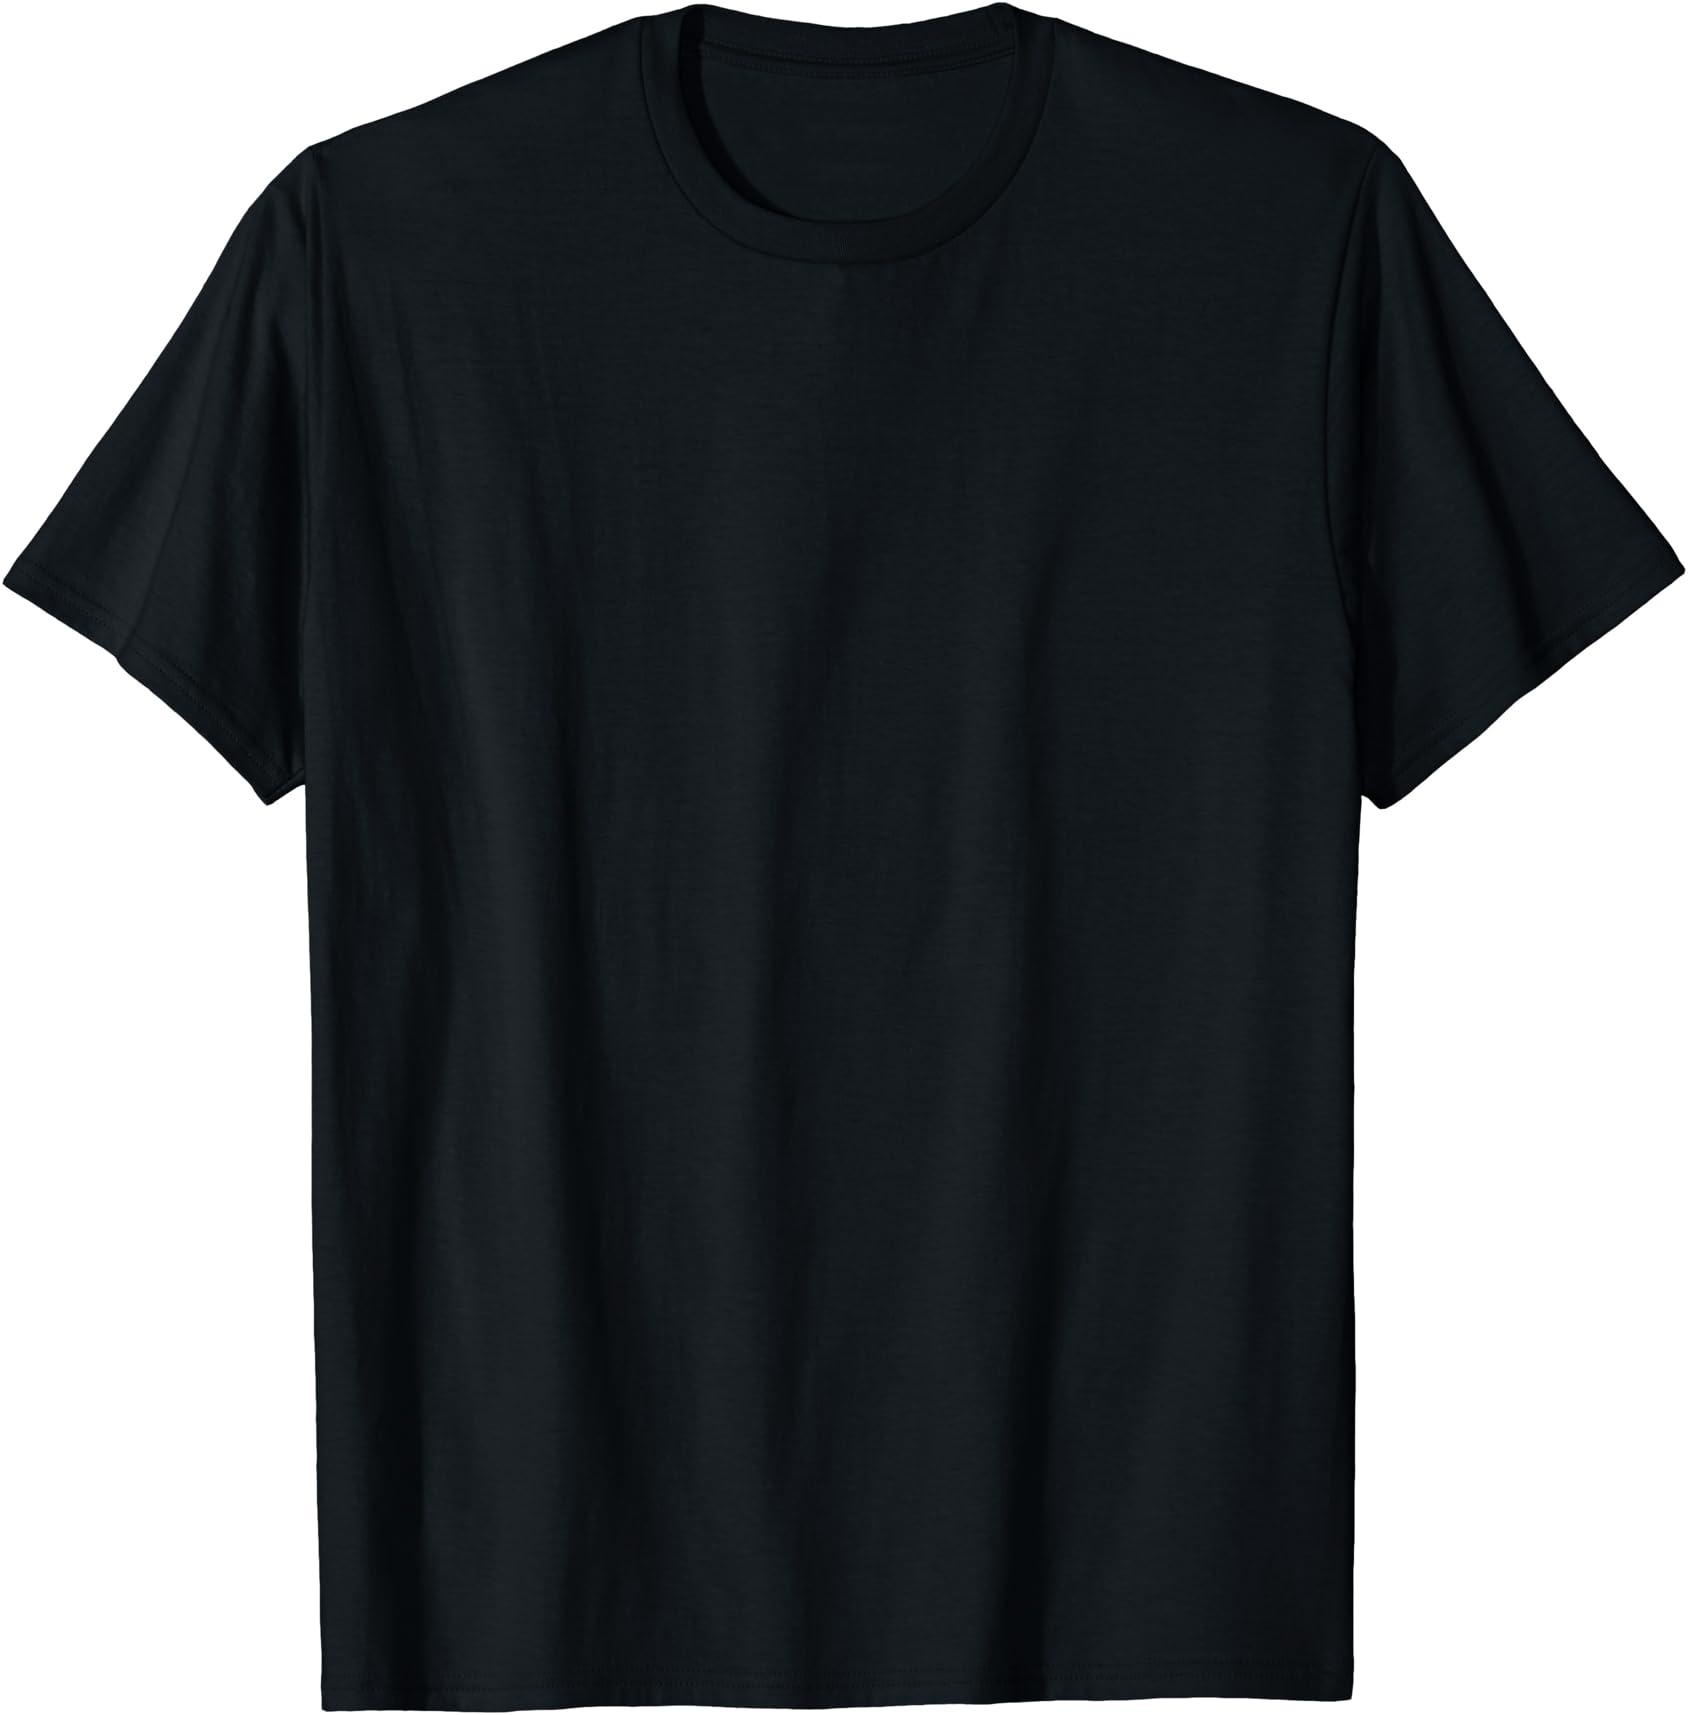 /'Keep Calm I/'m a Welder/' Welding Steelworker Funny Gift T-shirt Tee